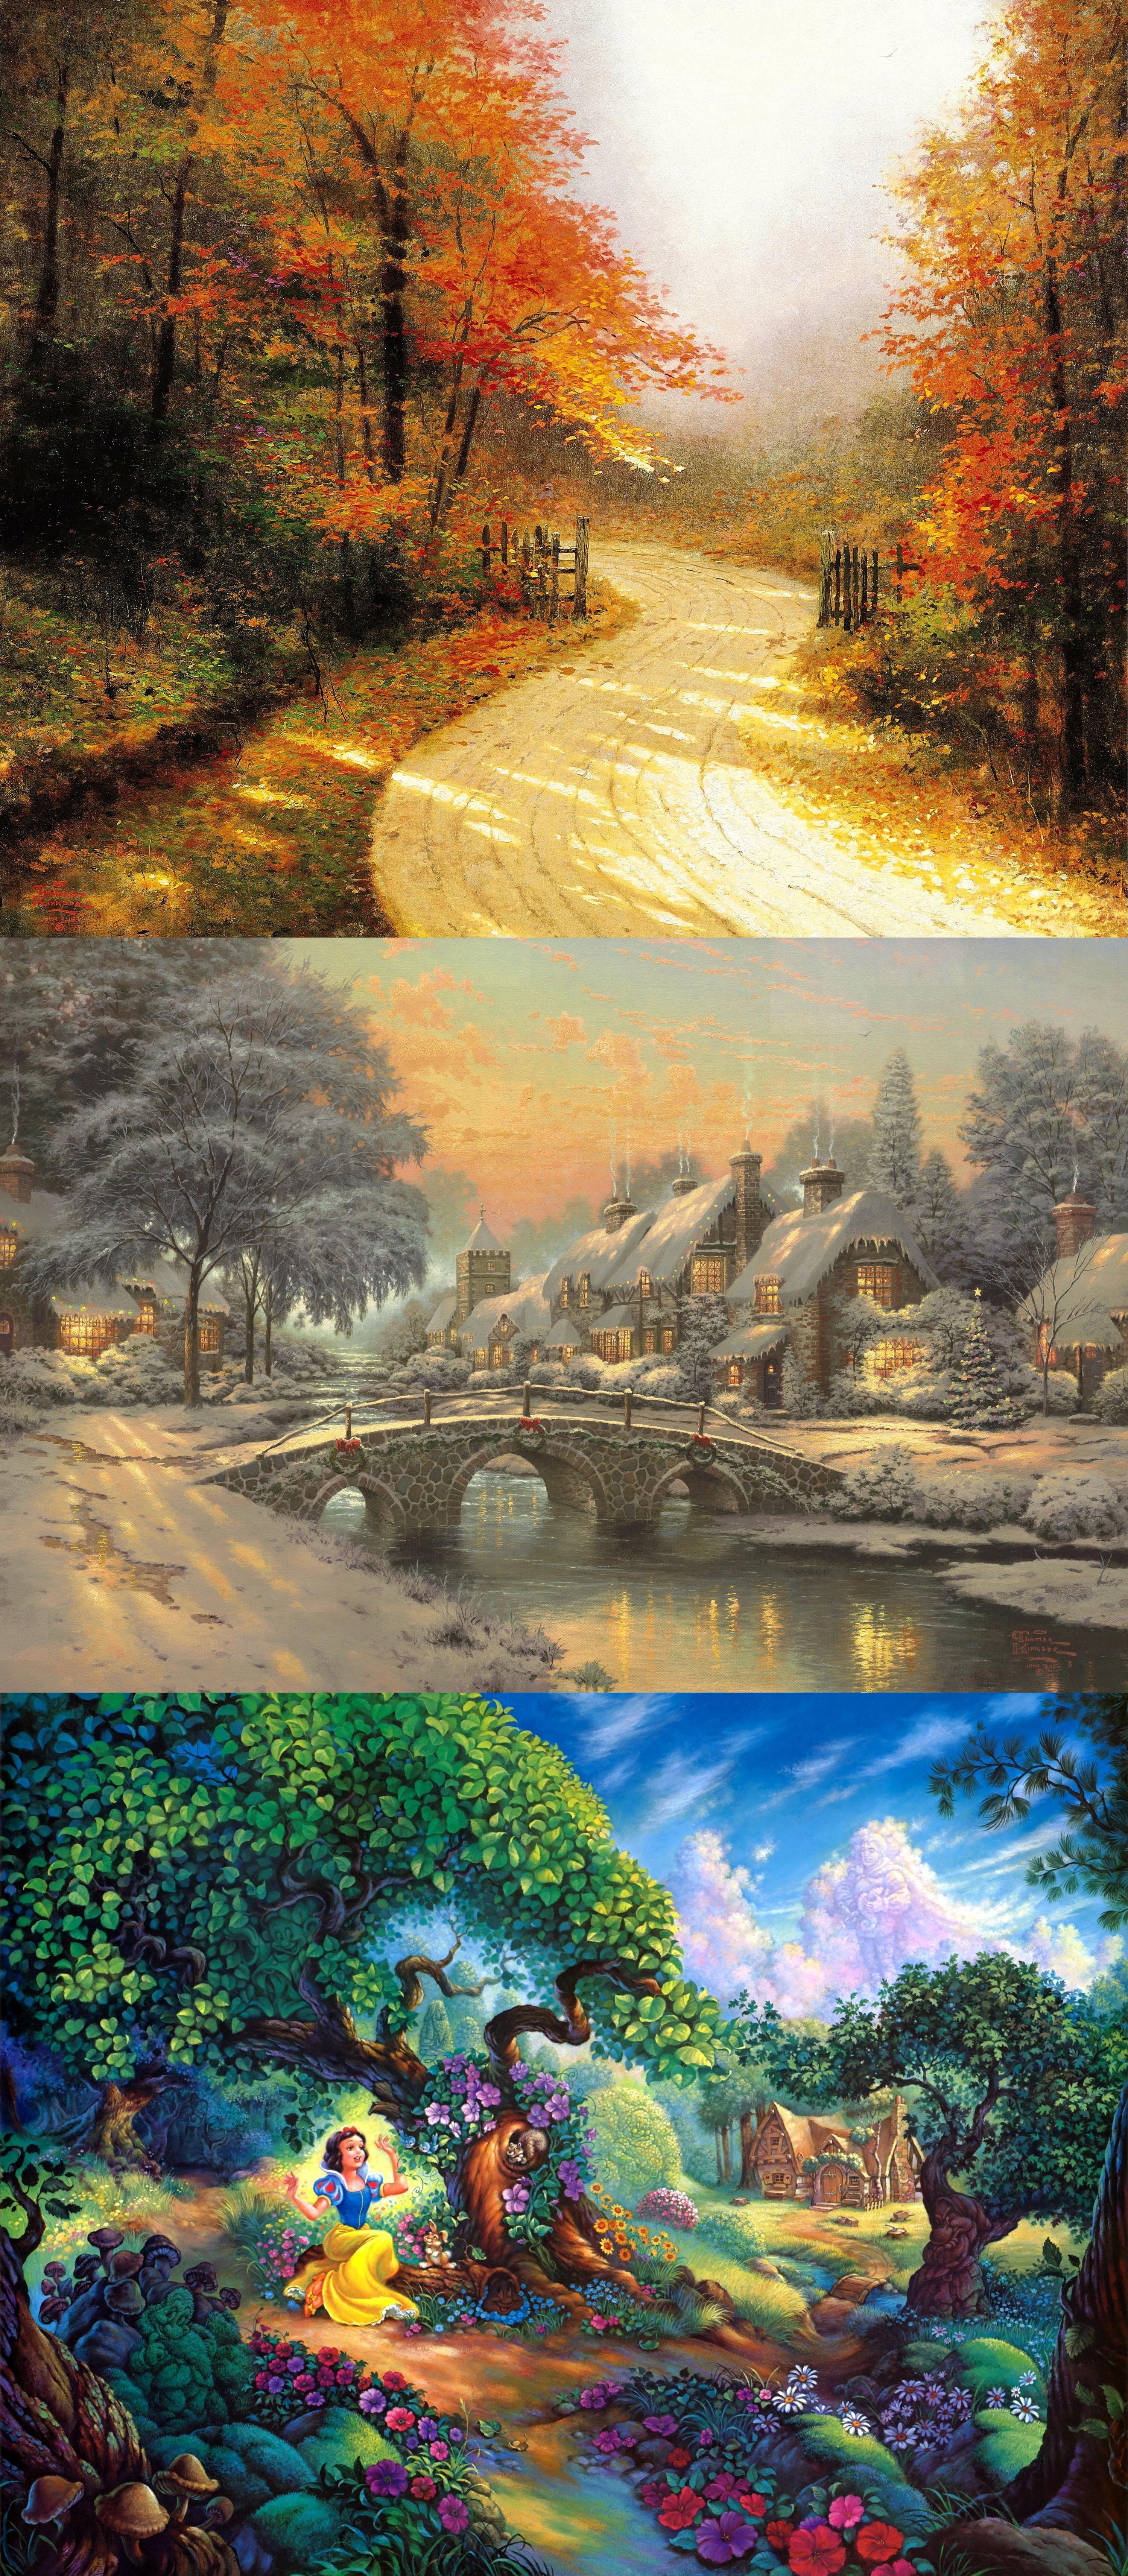 snow whites magical forest tom dubois painting walt disney